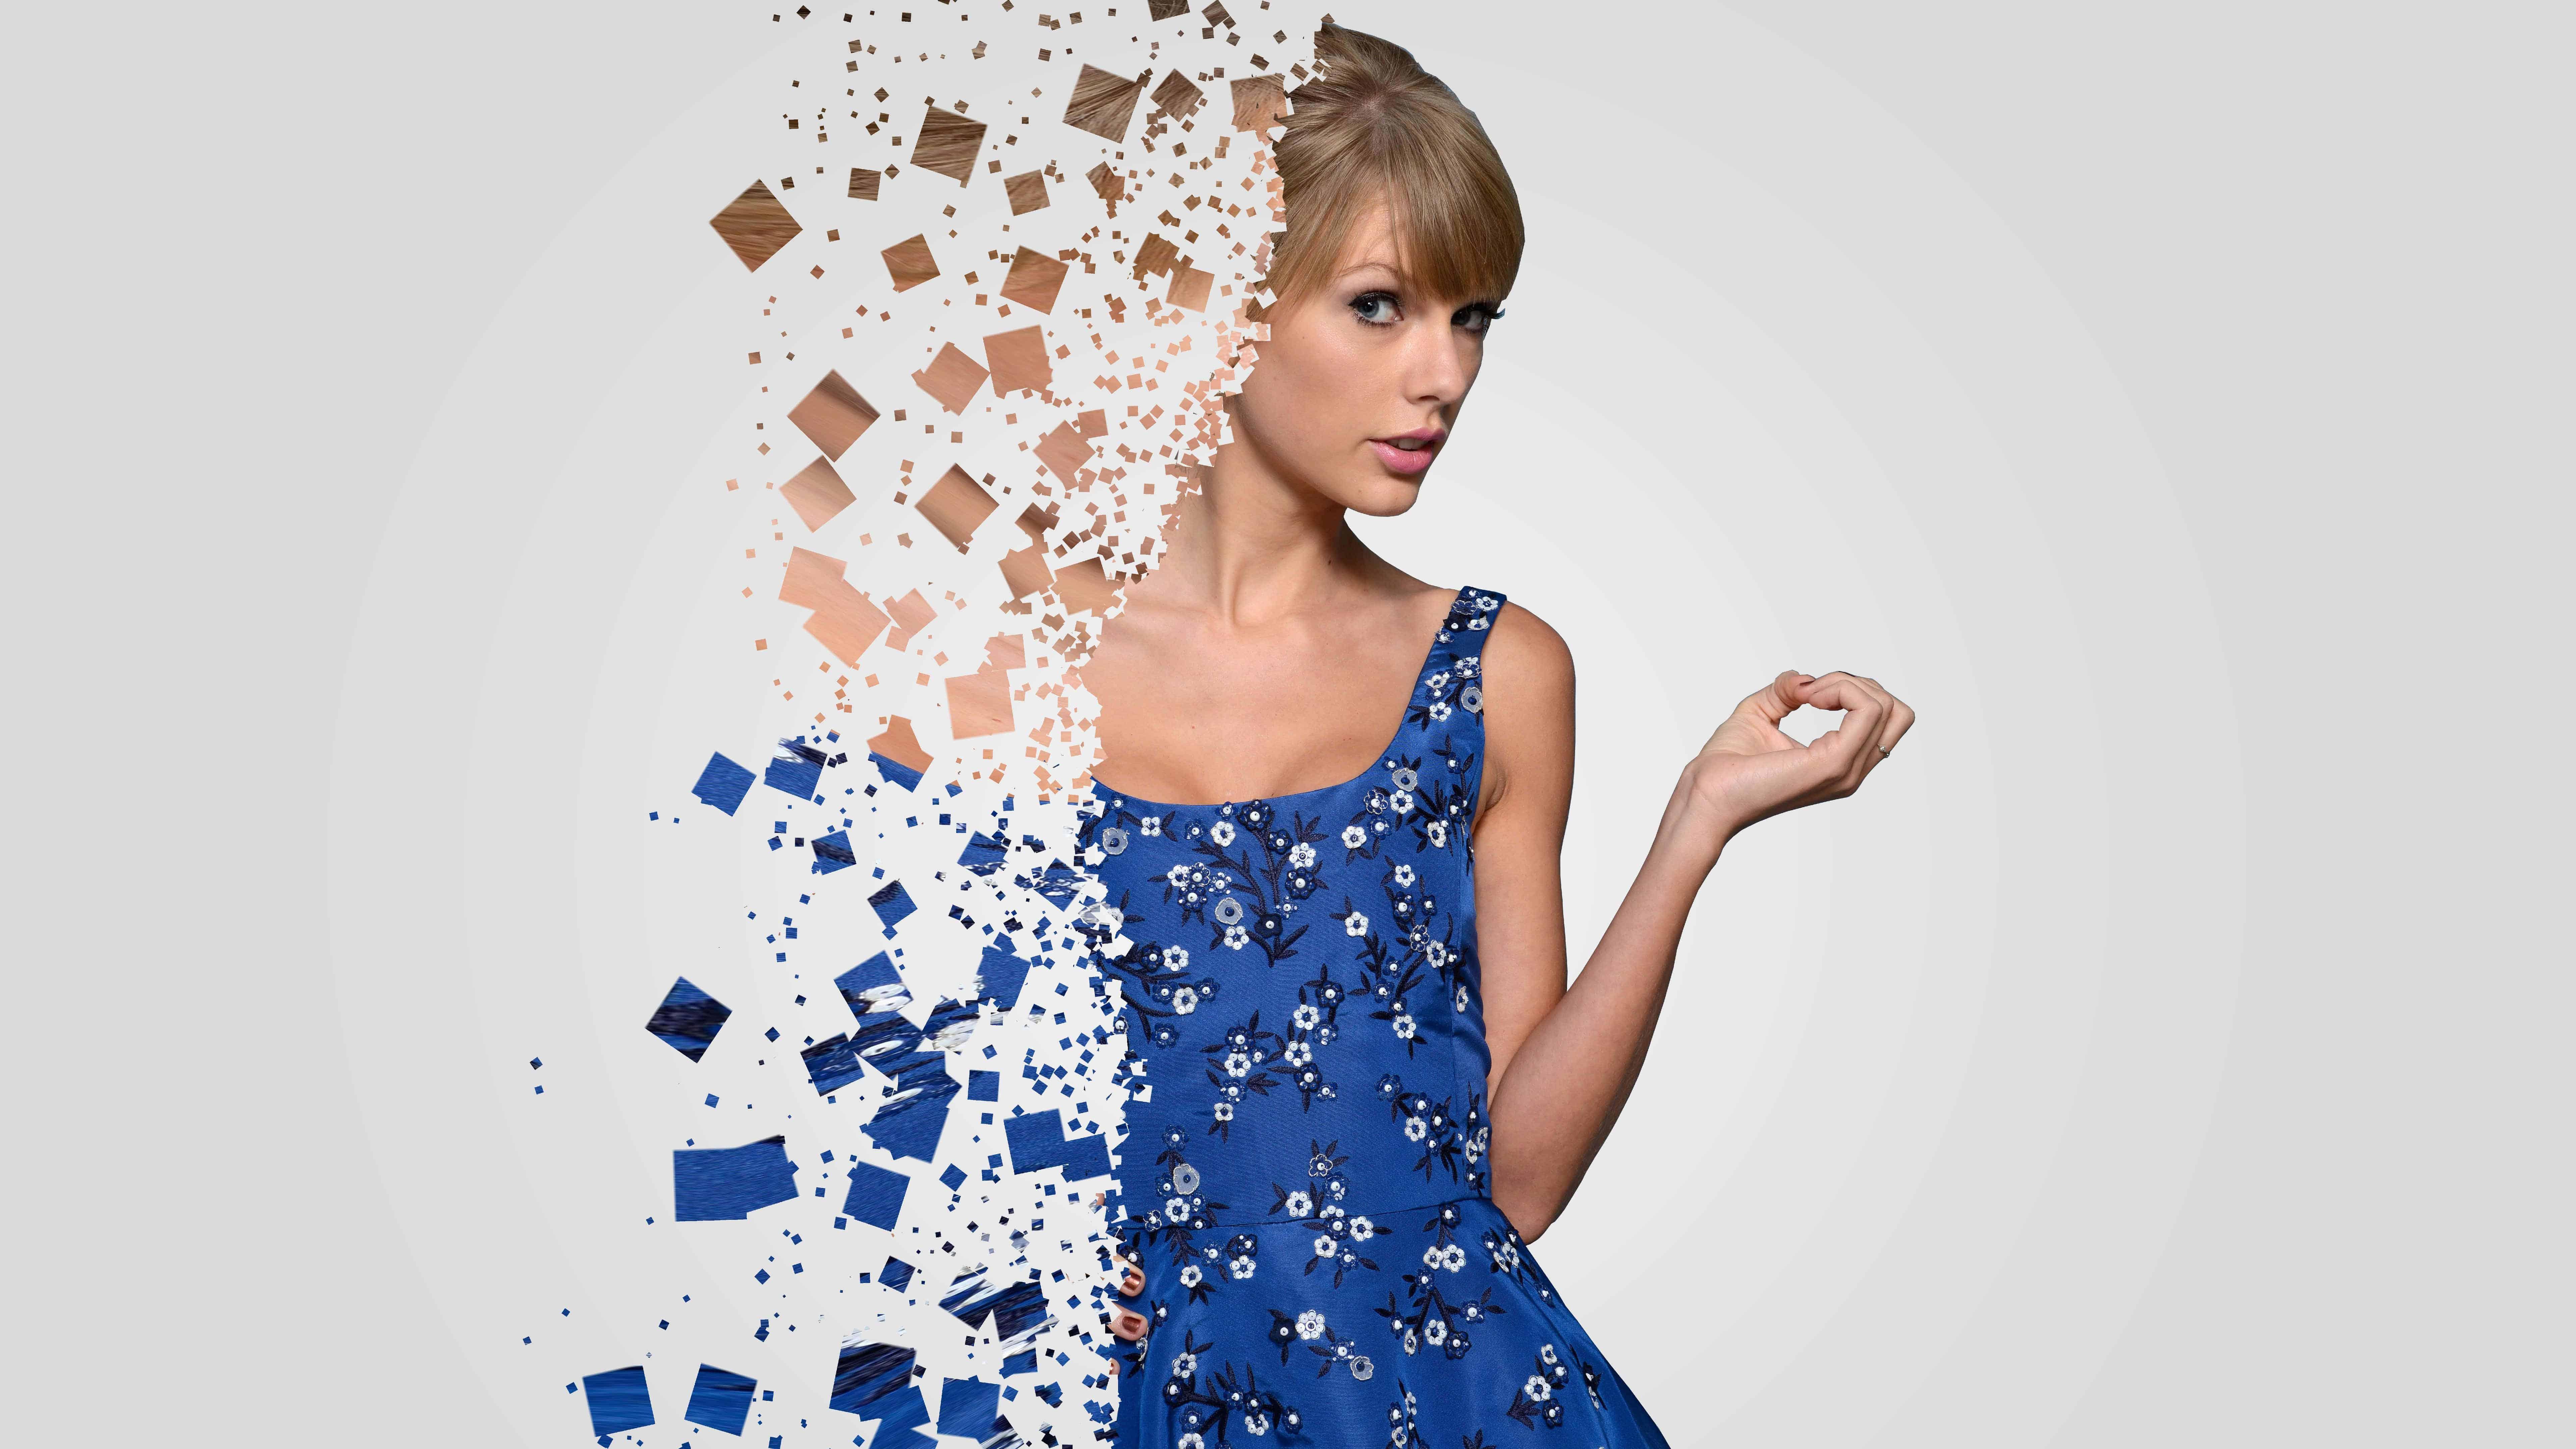 taylor swift blue dress uhd 8k wallpaper